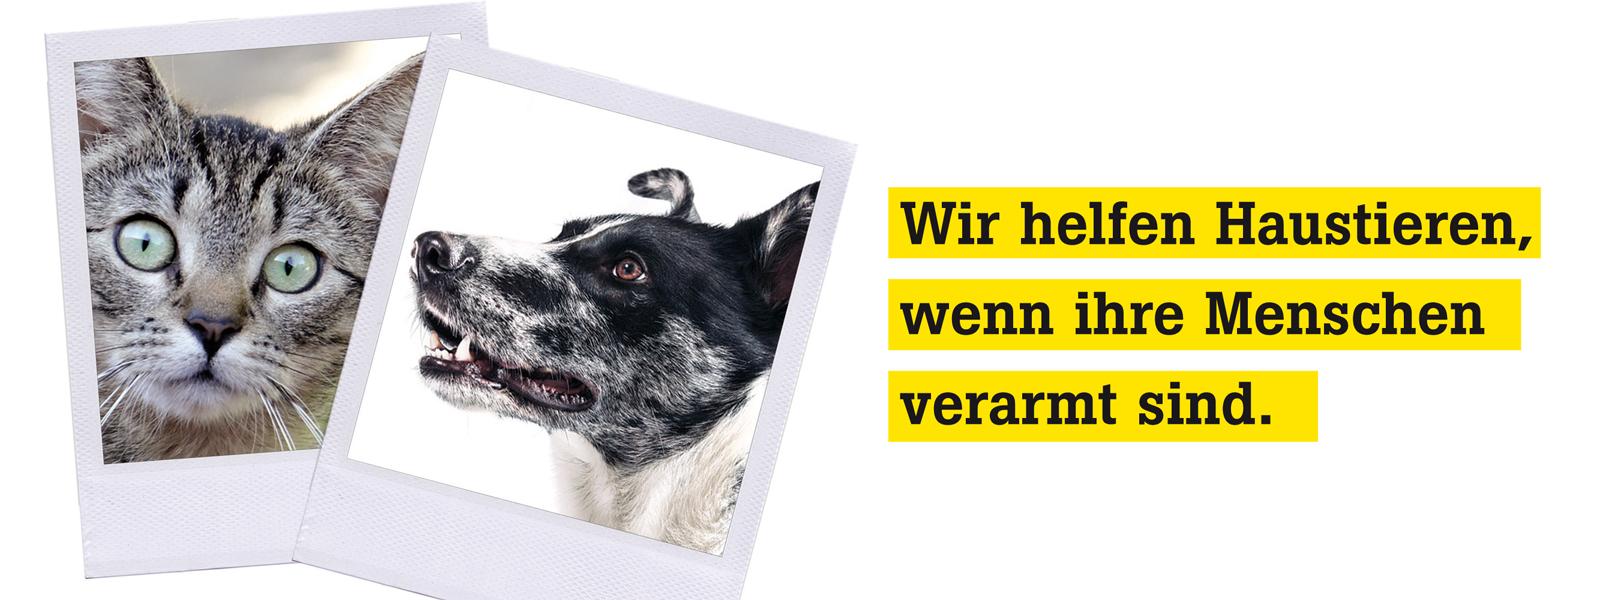 Hofer Tiertafel e.V.